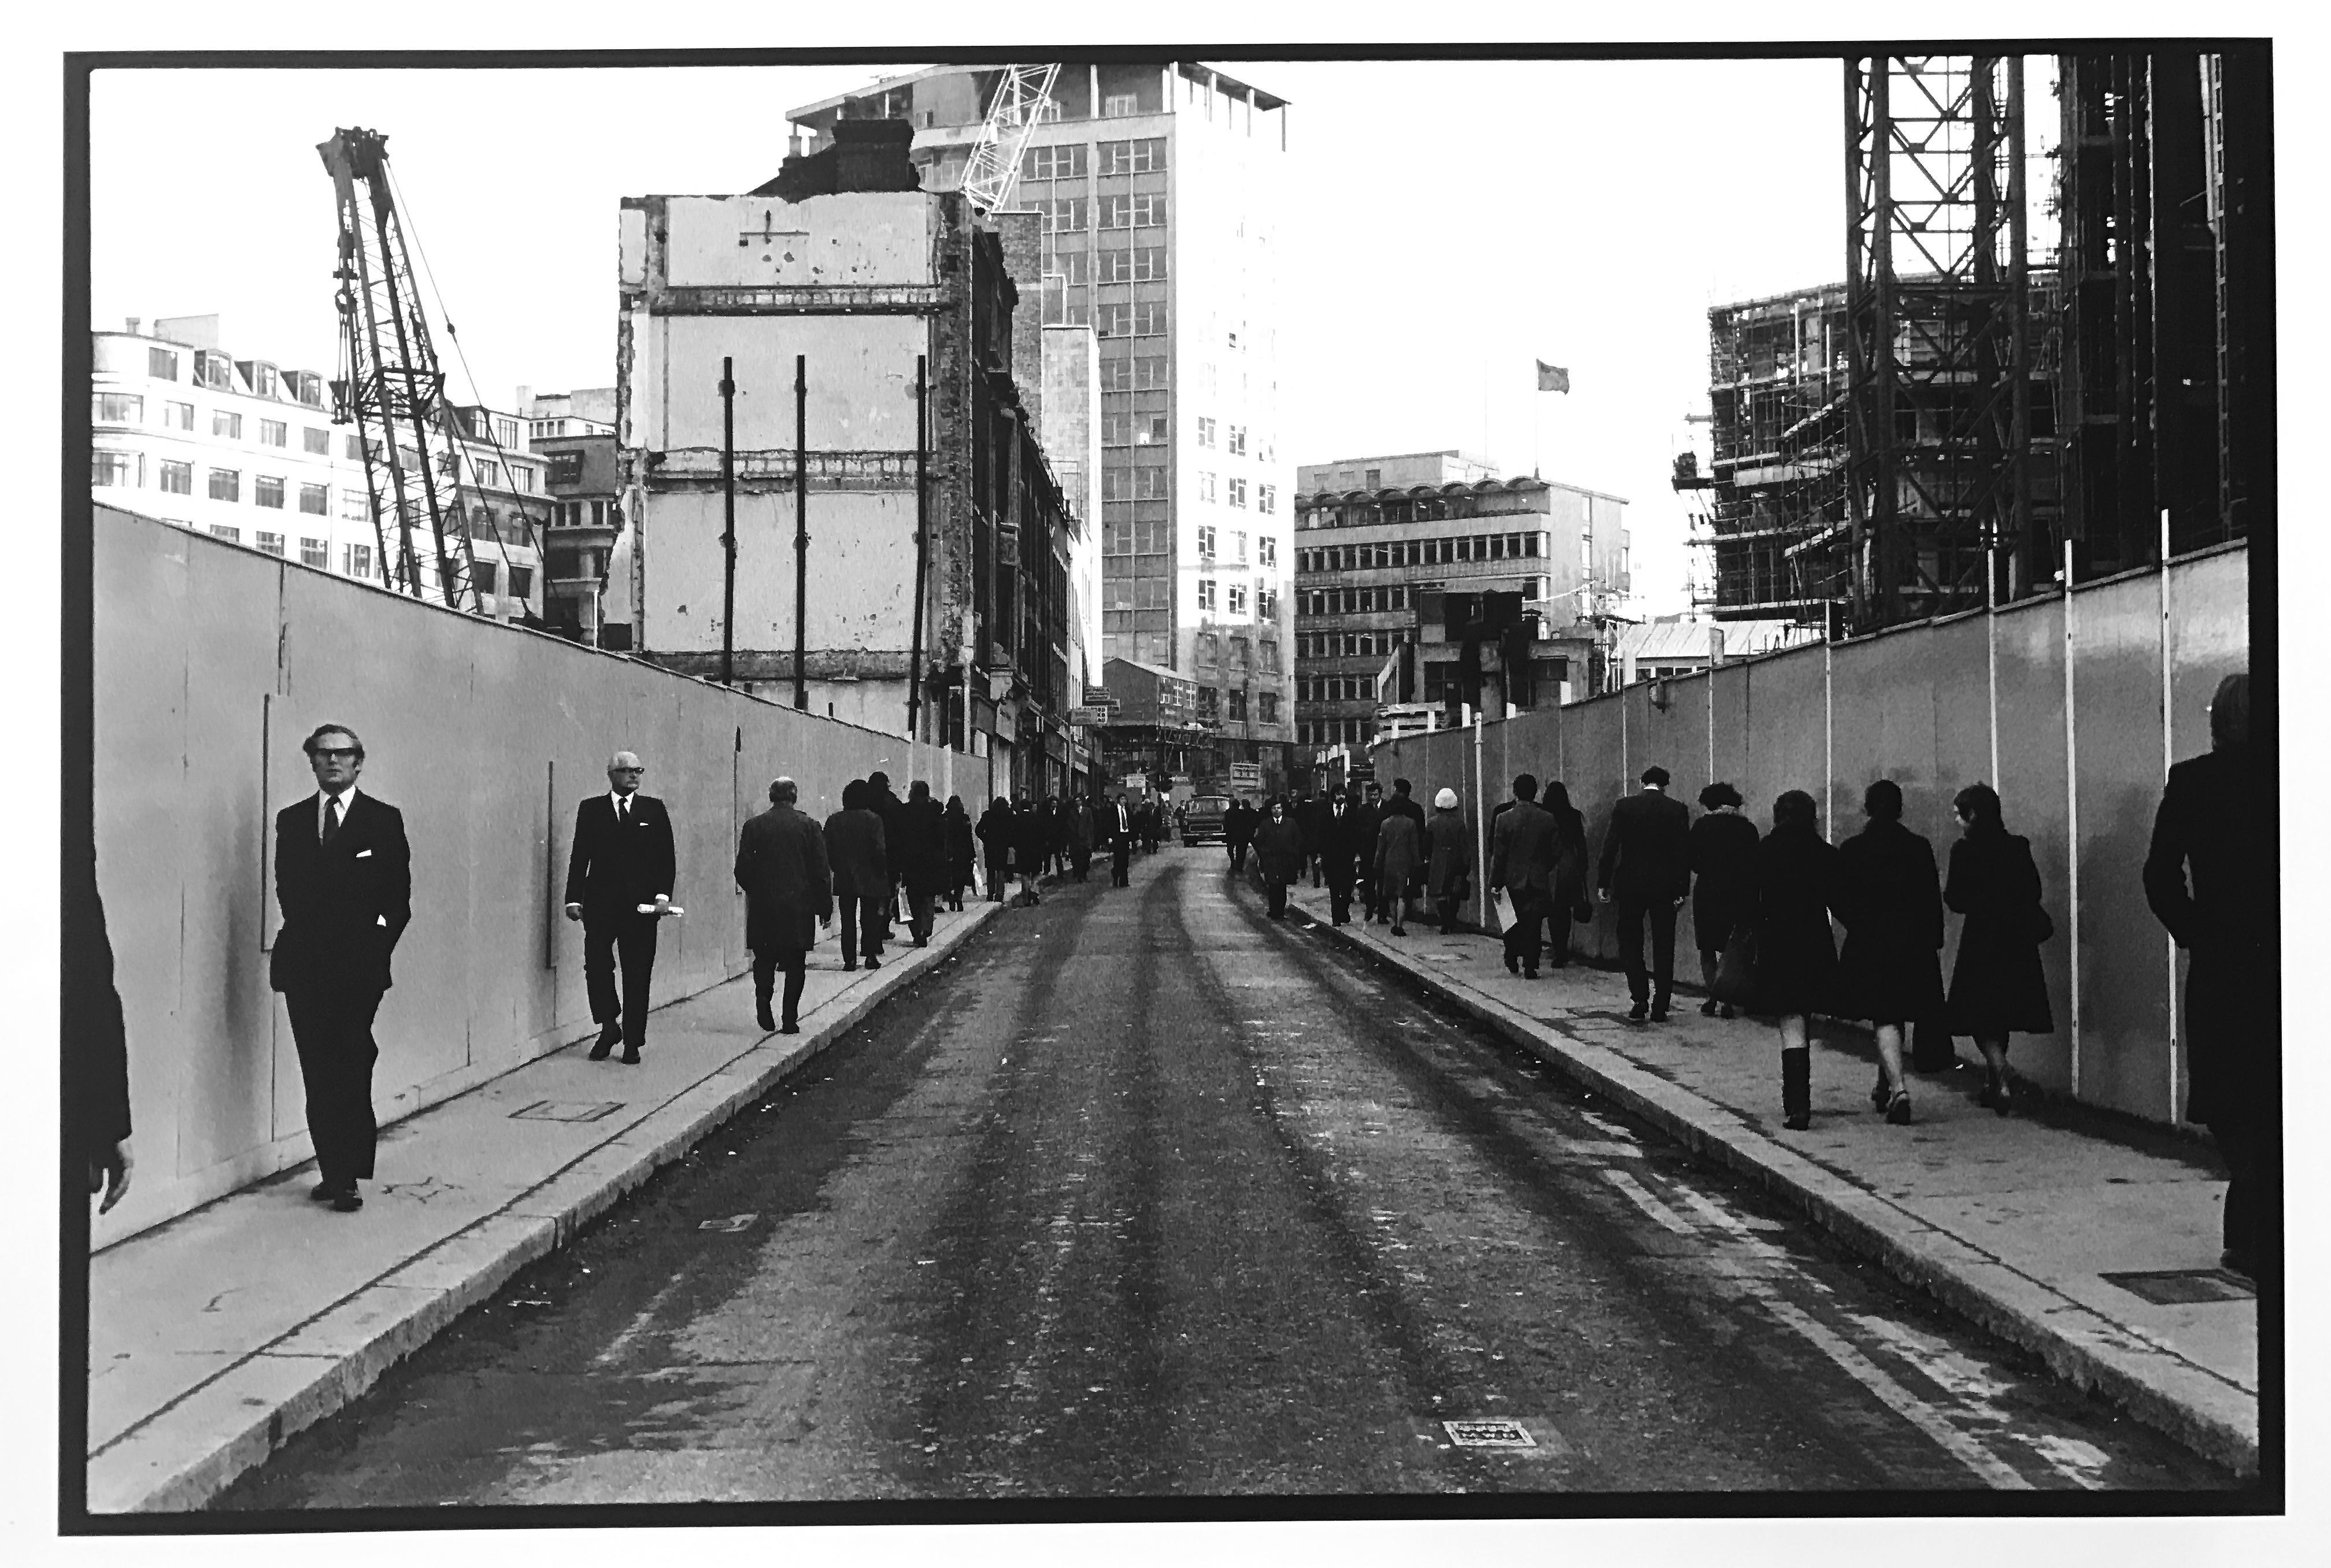 Businessmen in London, Street Photography England 1970s, Vintage Print